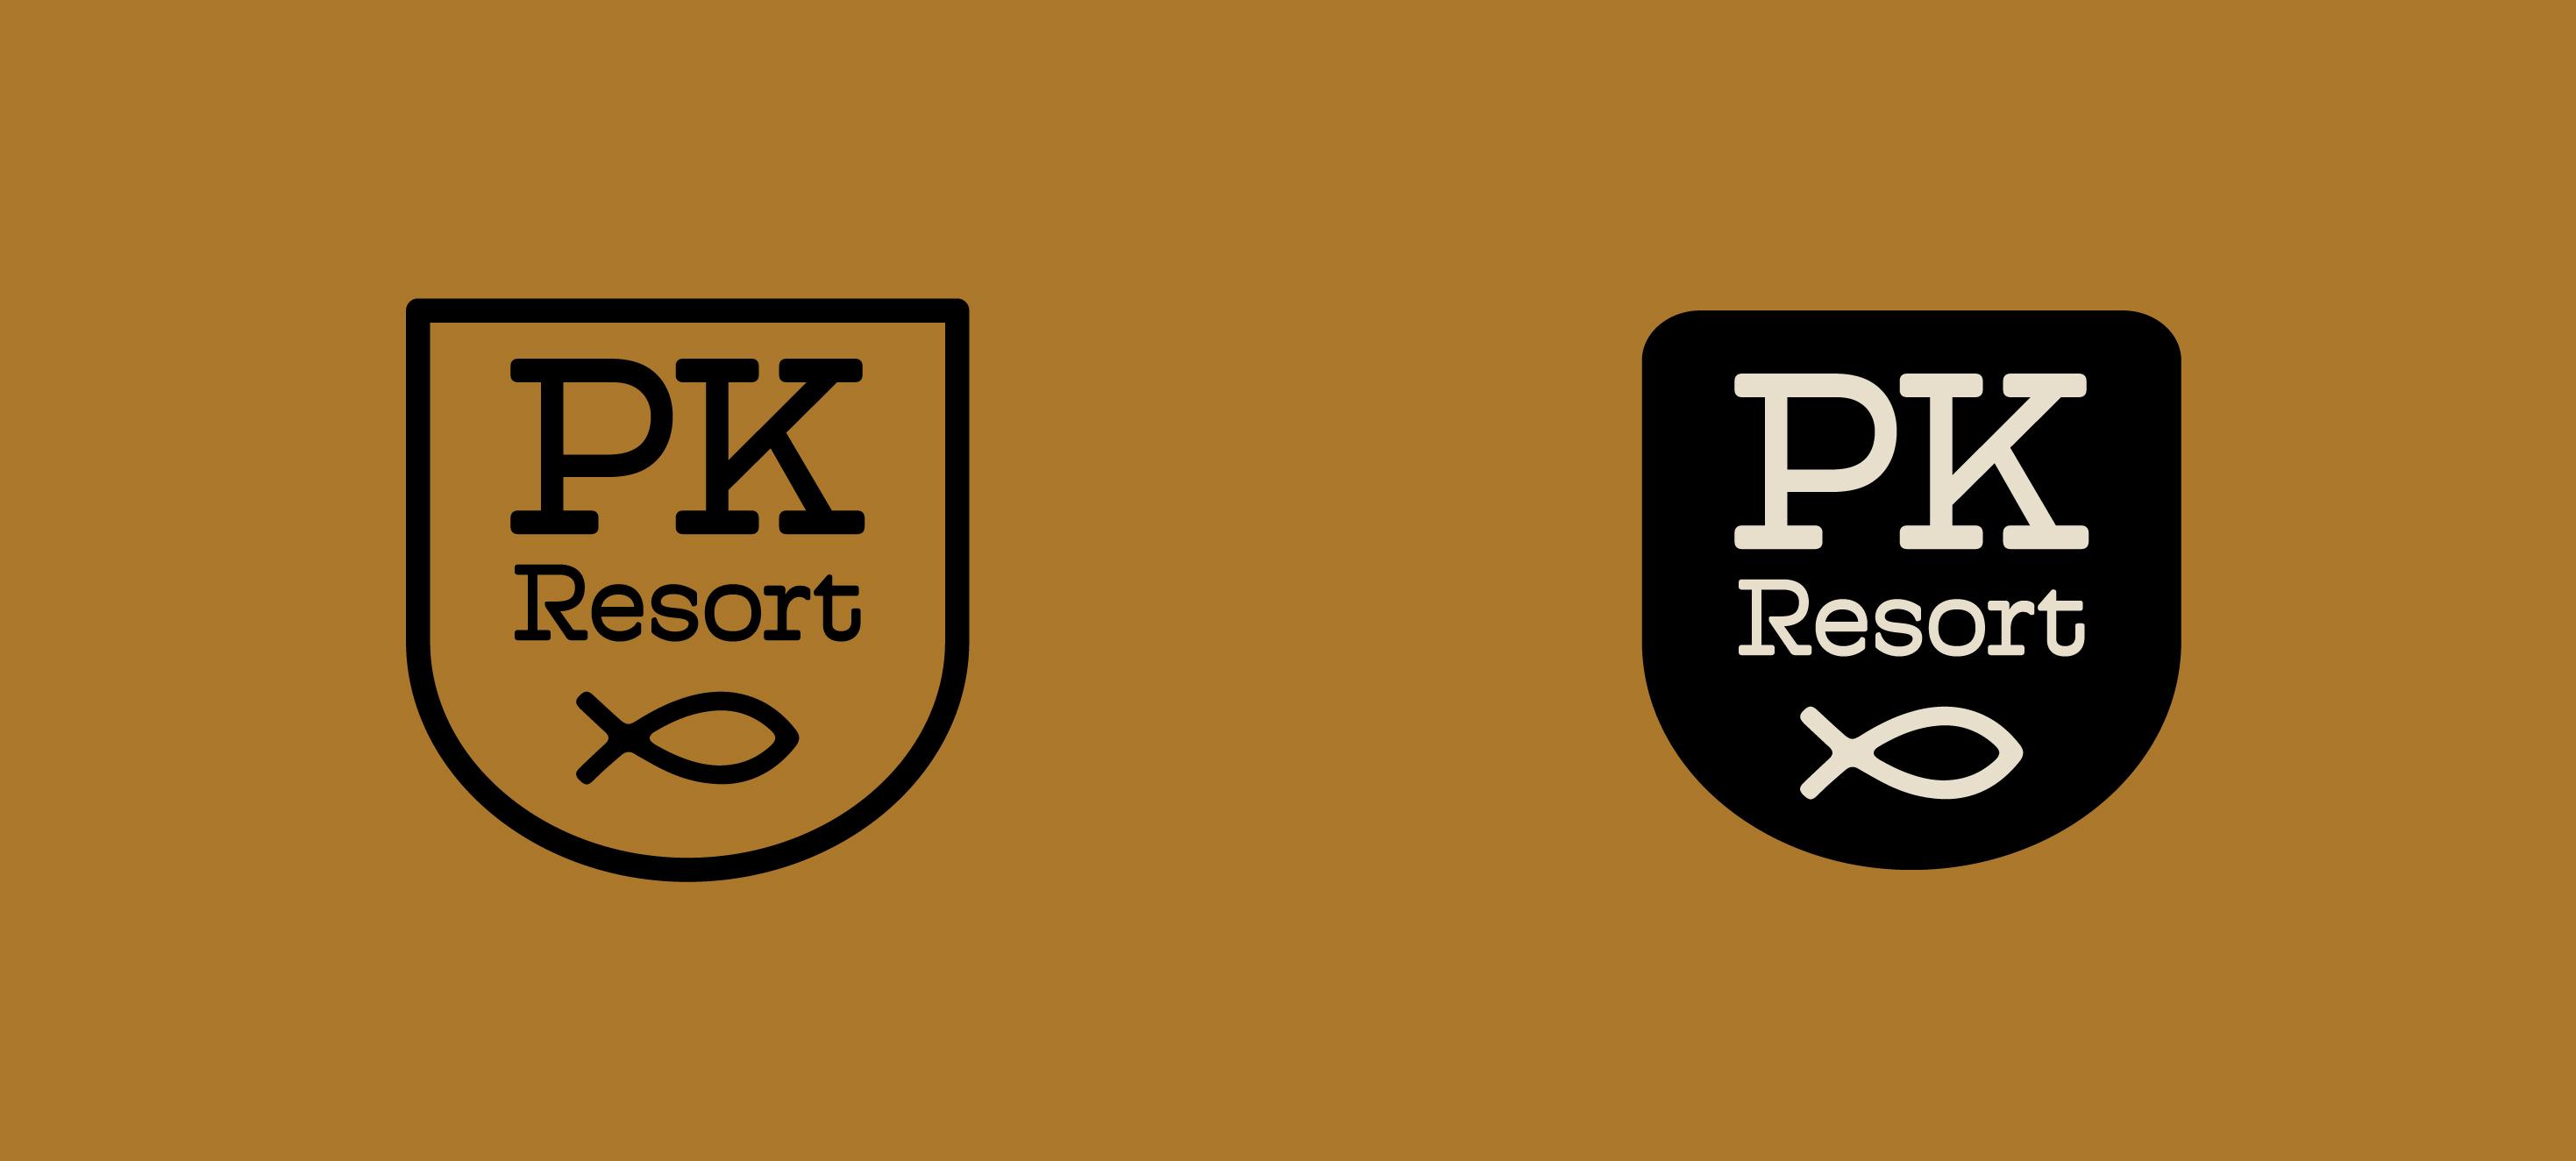 PK Badges